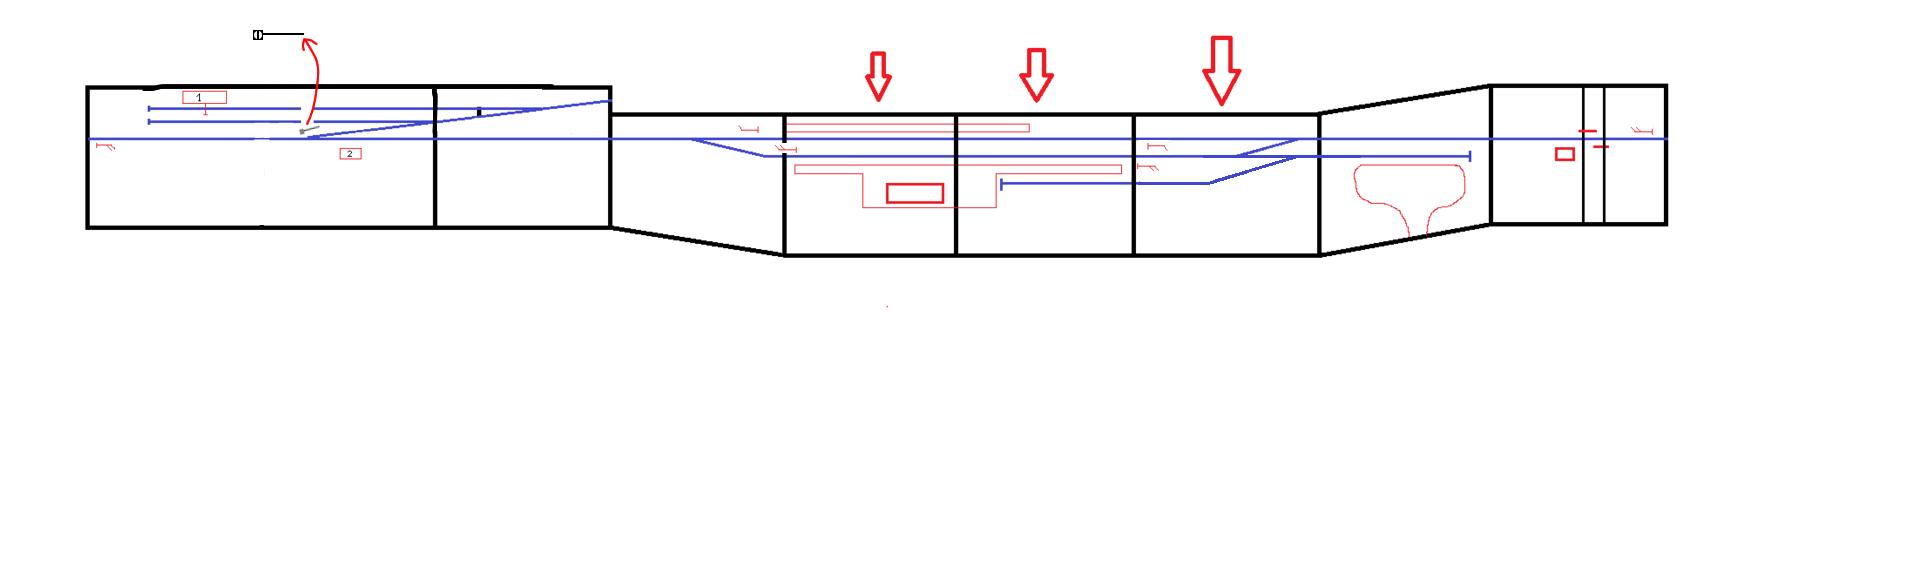 MODU(2~1[1] - Kopia.PNG